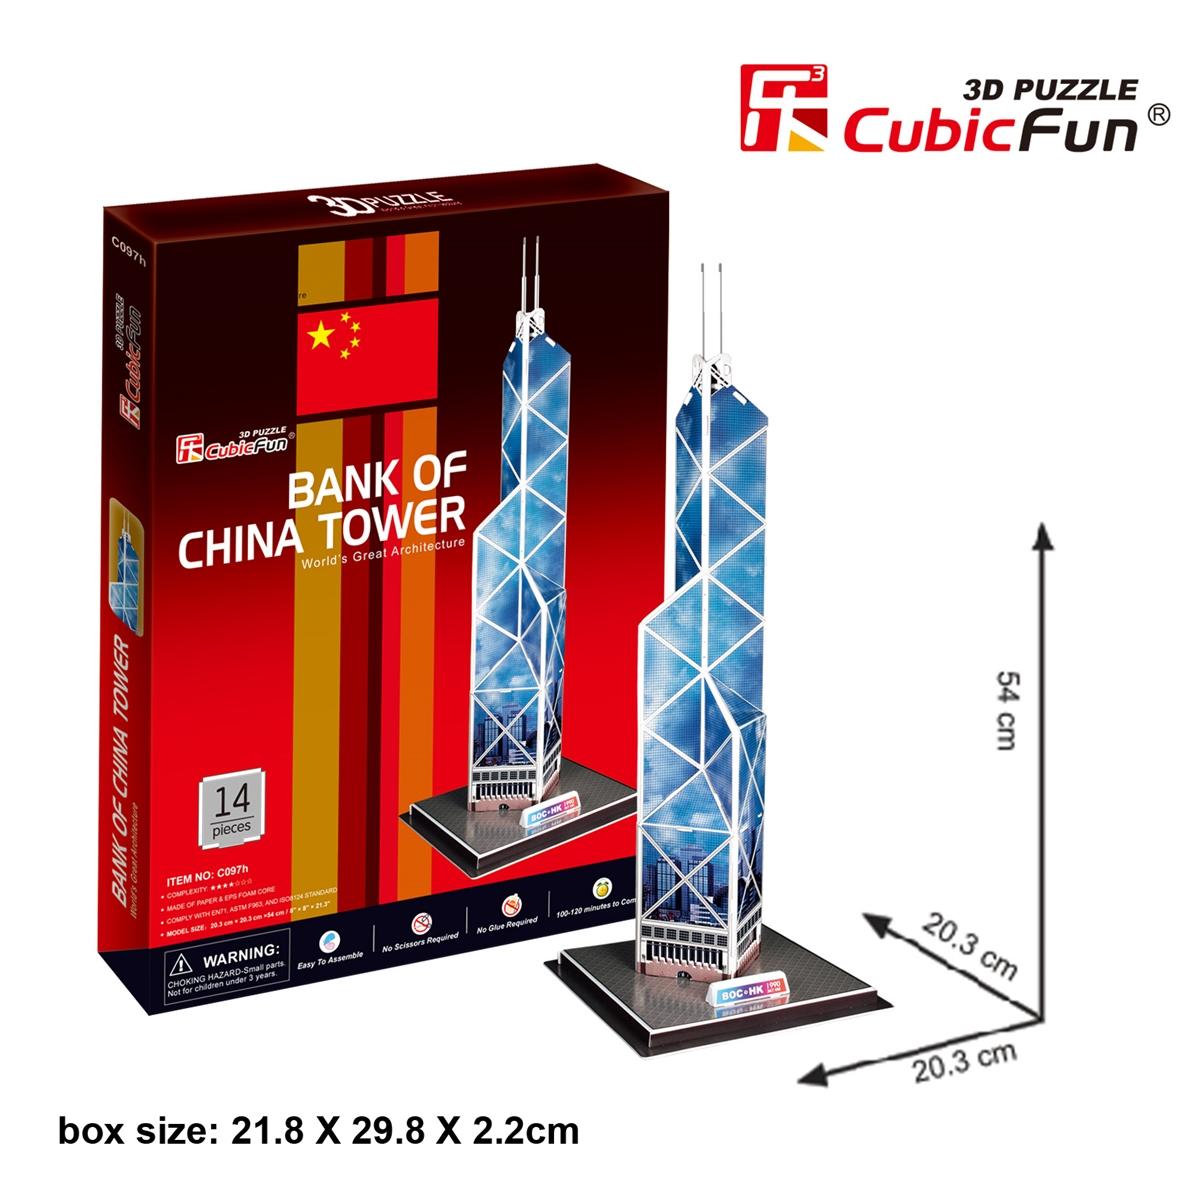 CubicFun 3D Puzzle Bank of China Tower แบงค์ออฟไชน่าทาวเวอร์ Size 20.3*20.3*54 Total 14 pcs.